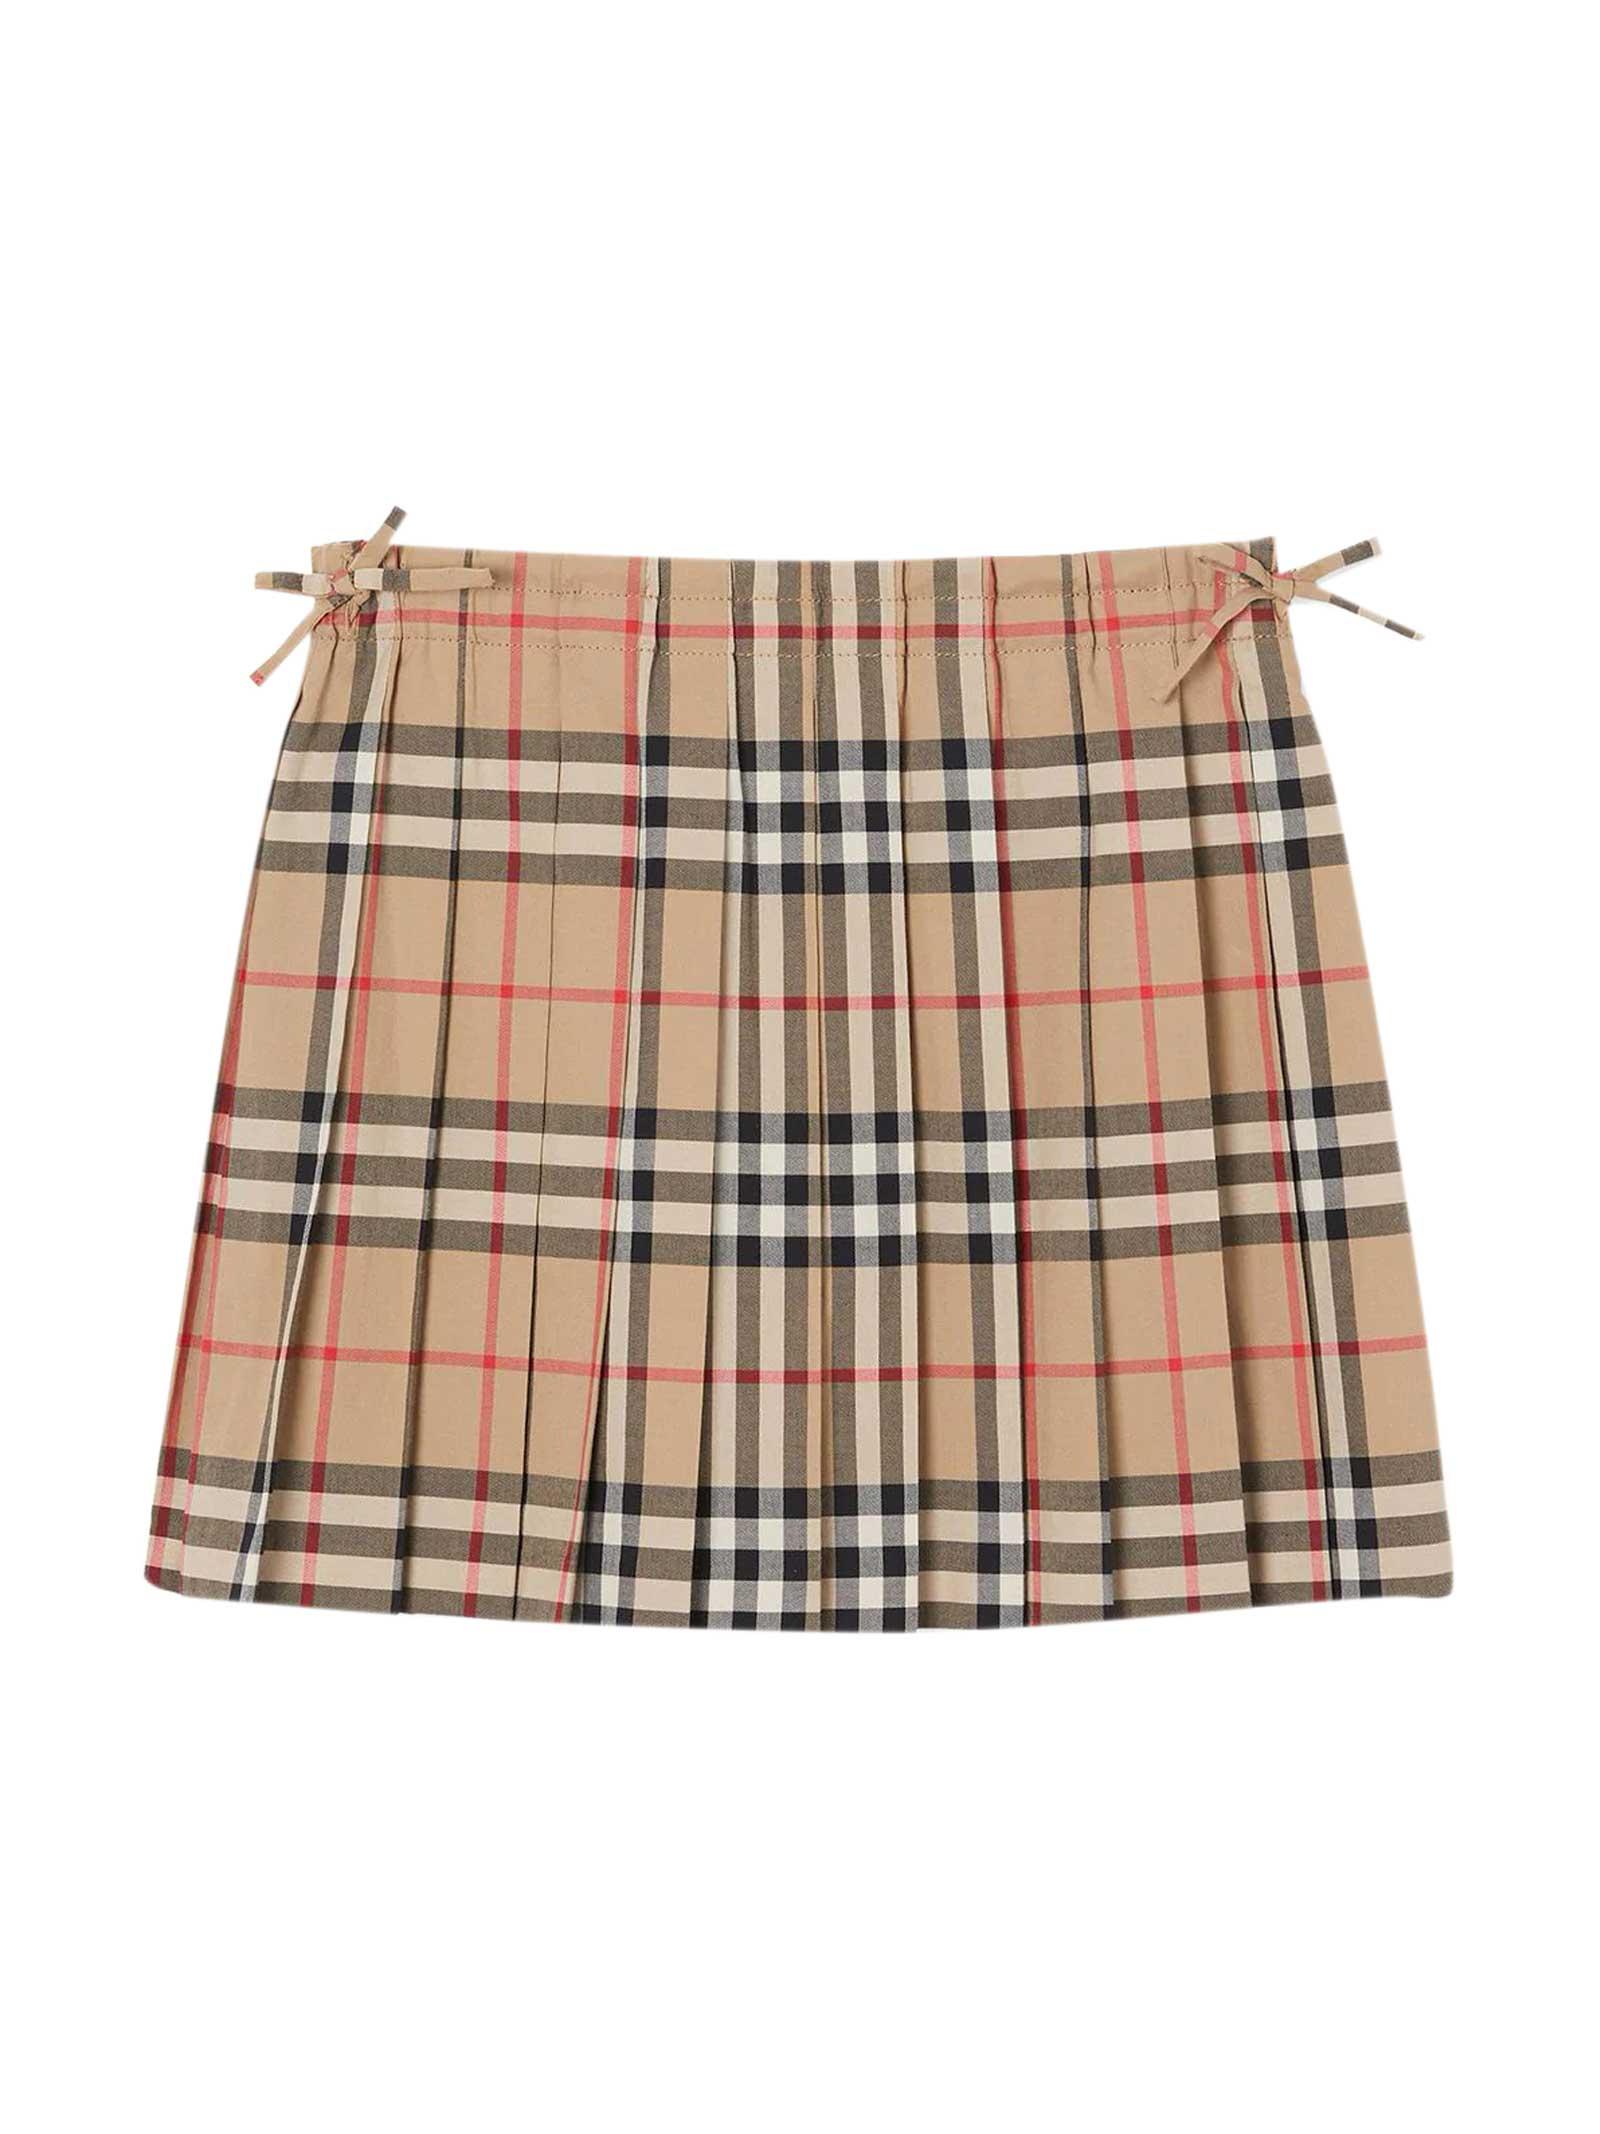 Burberry Kids' Beige Skirt